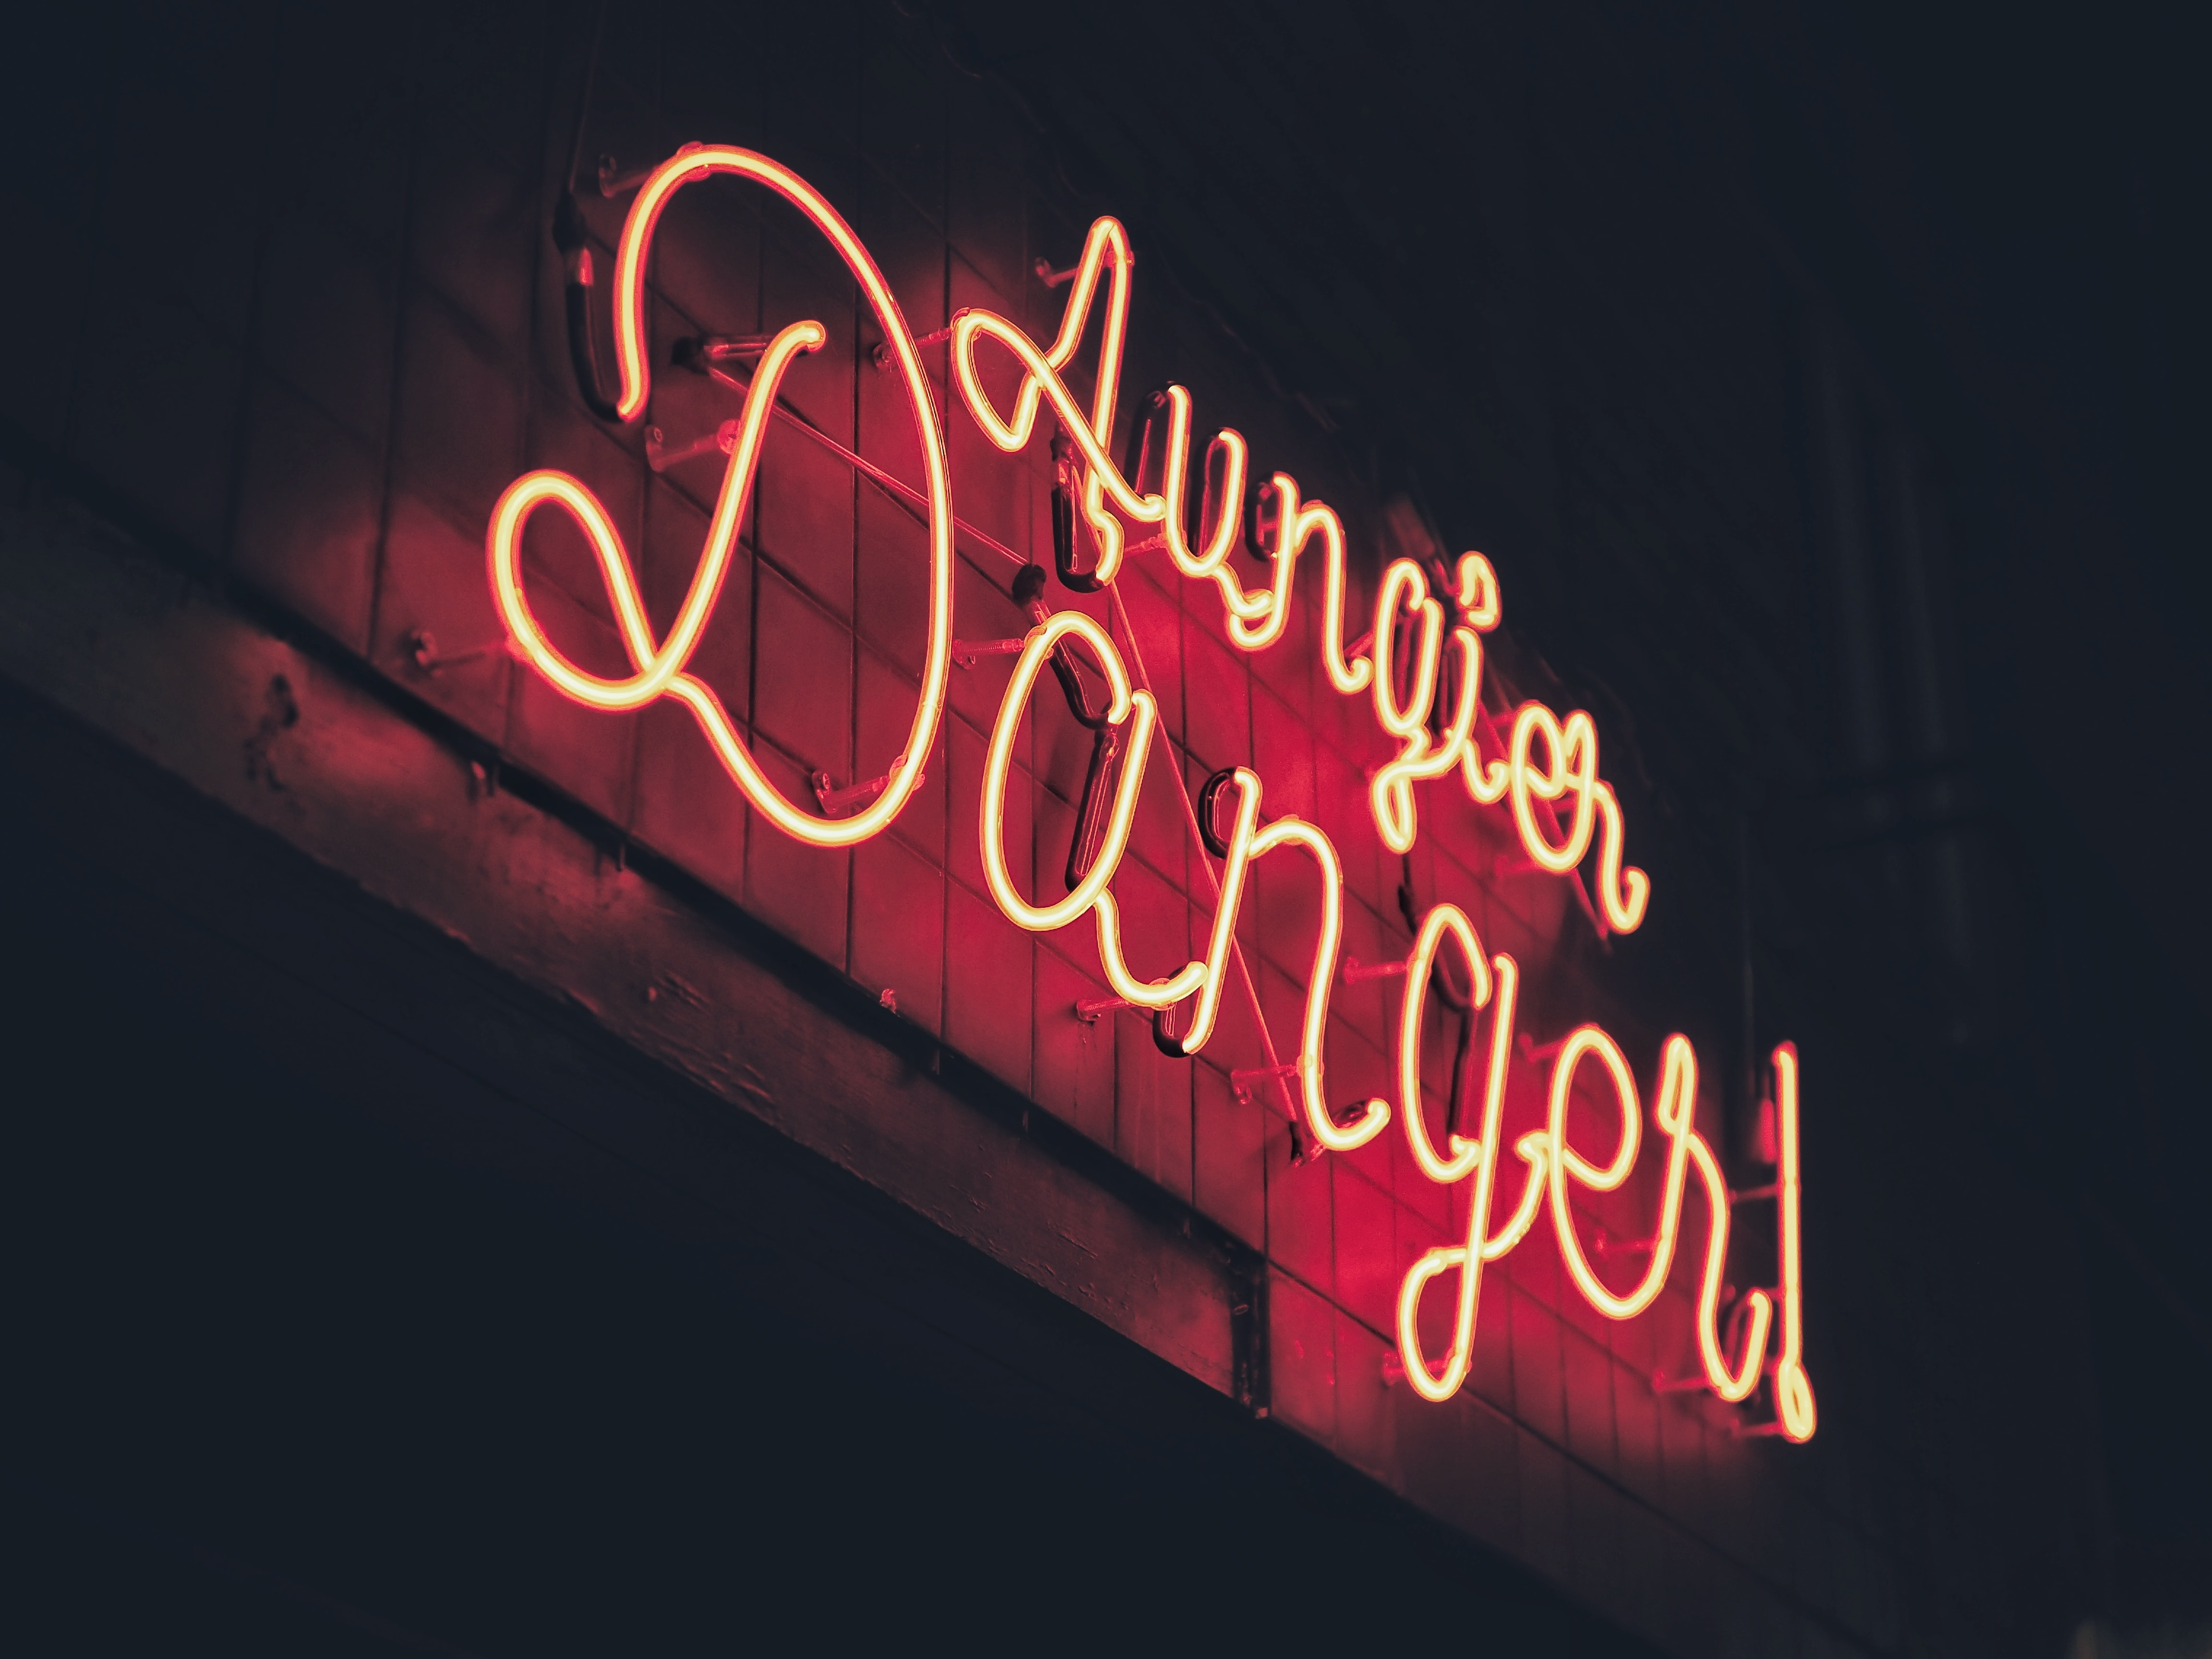 closeup photo of lighted signage